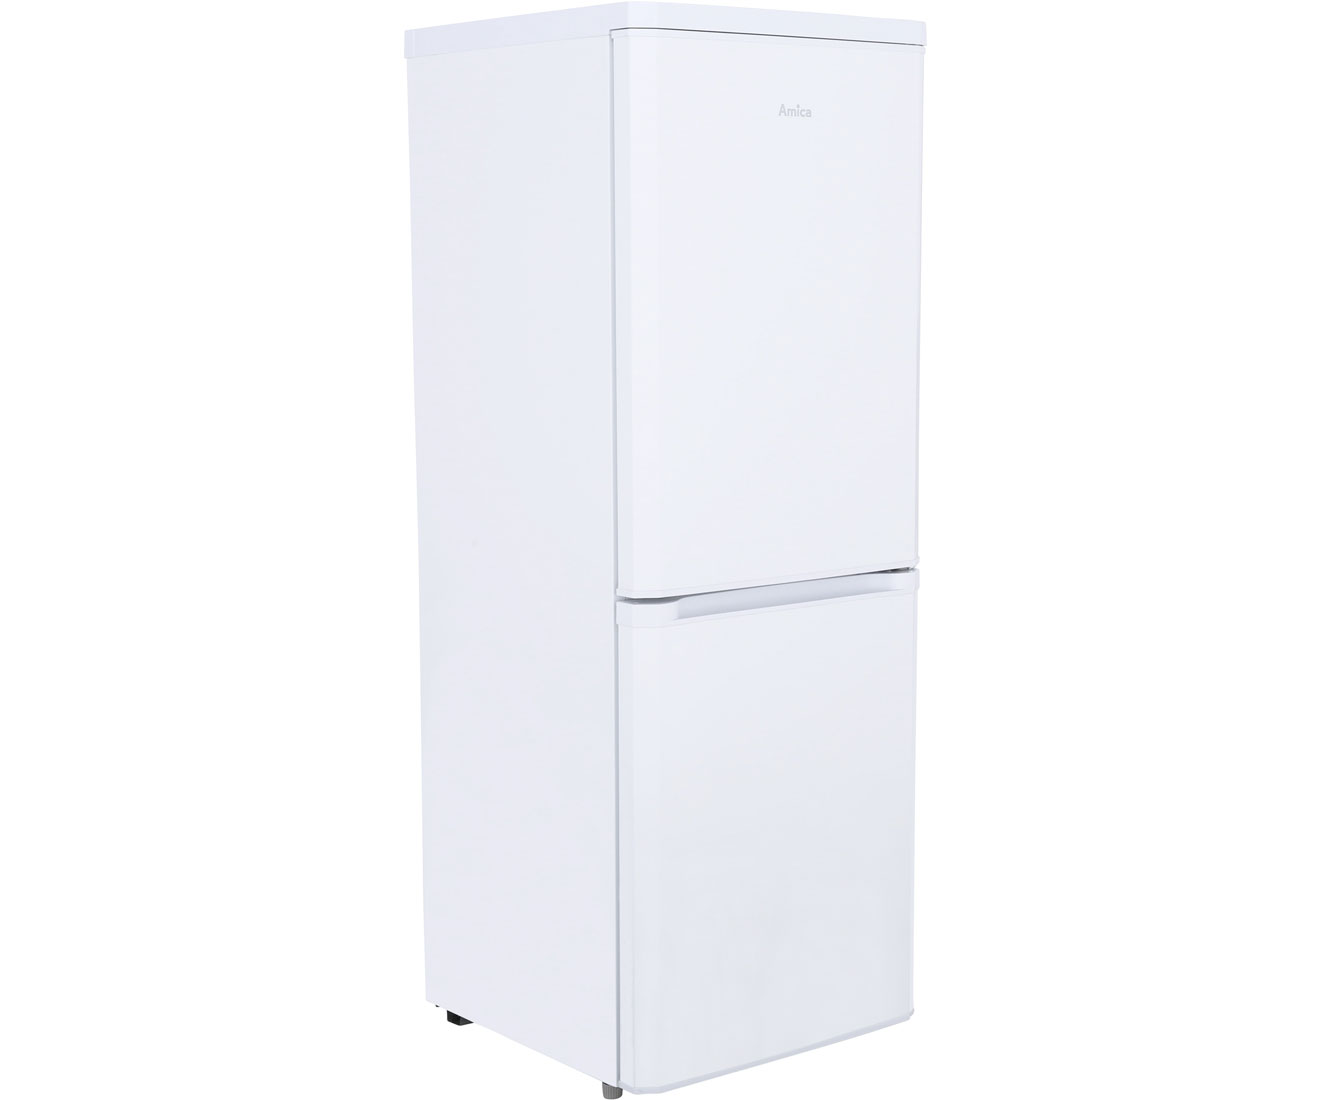 Amica Retro Kühlschrank Pink : Amica retro kühlschrank pink retro kühlschrank in düsseldorf ebay